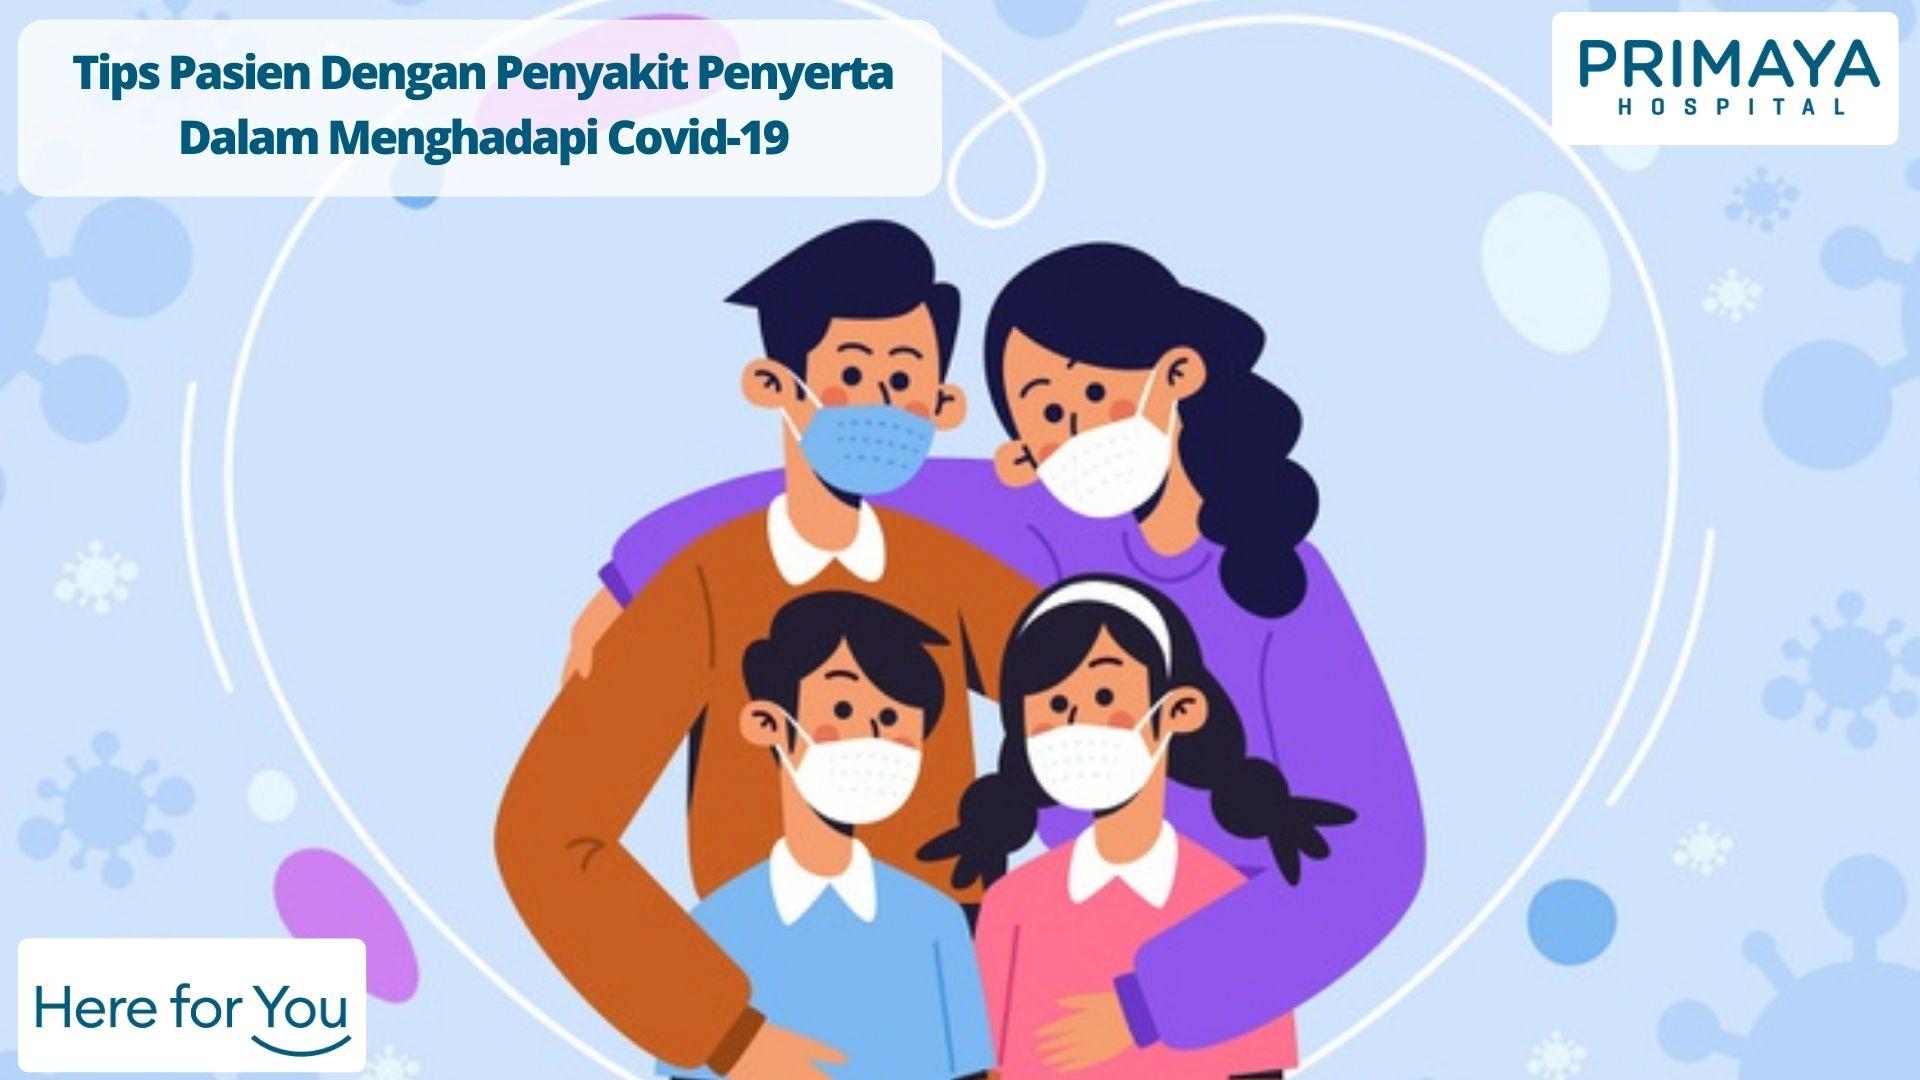 Tips Pasien Dengan Penyakit Penyerta Dalam Menghadapi Covid-19